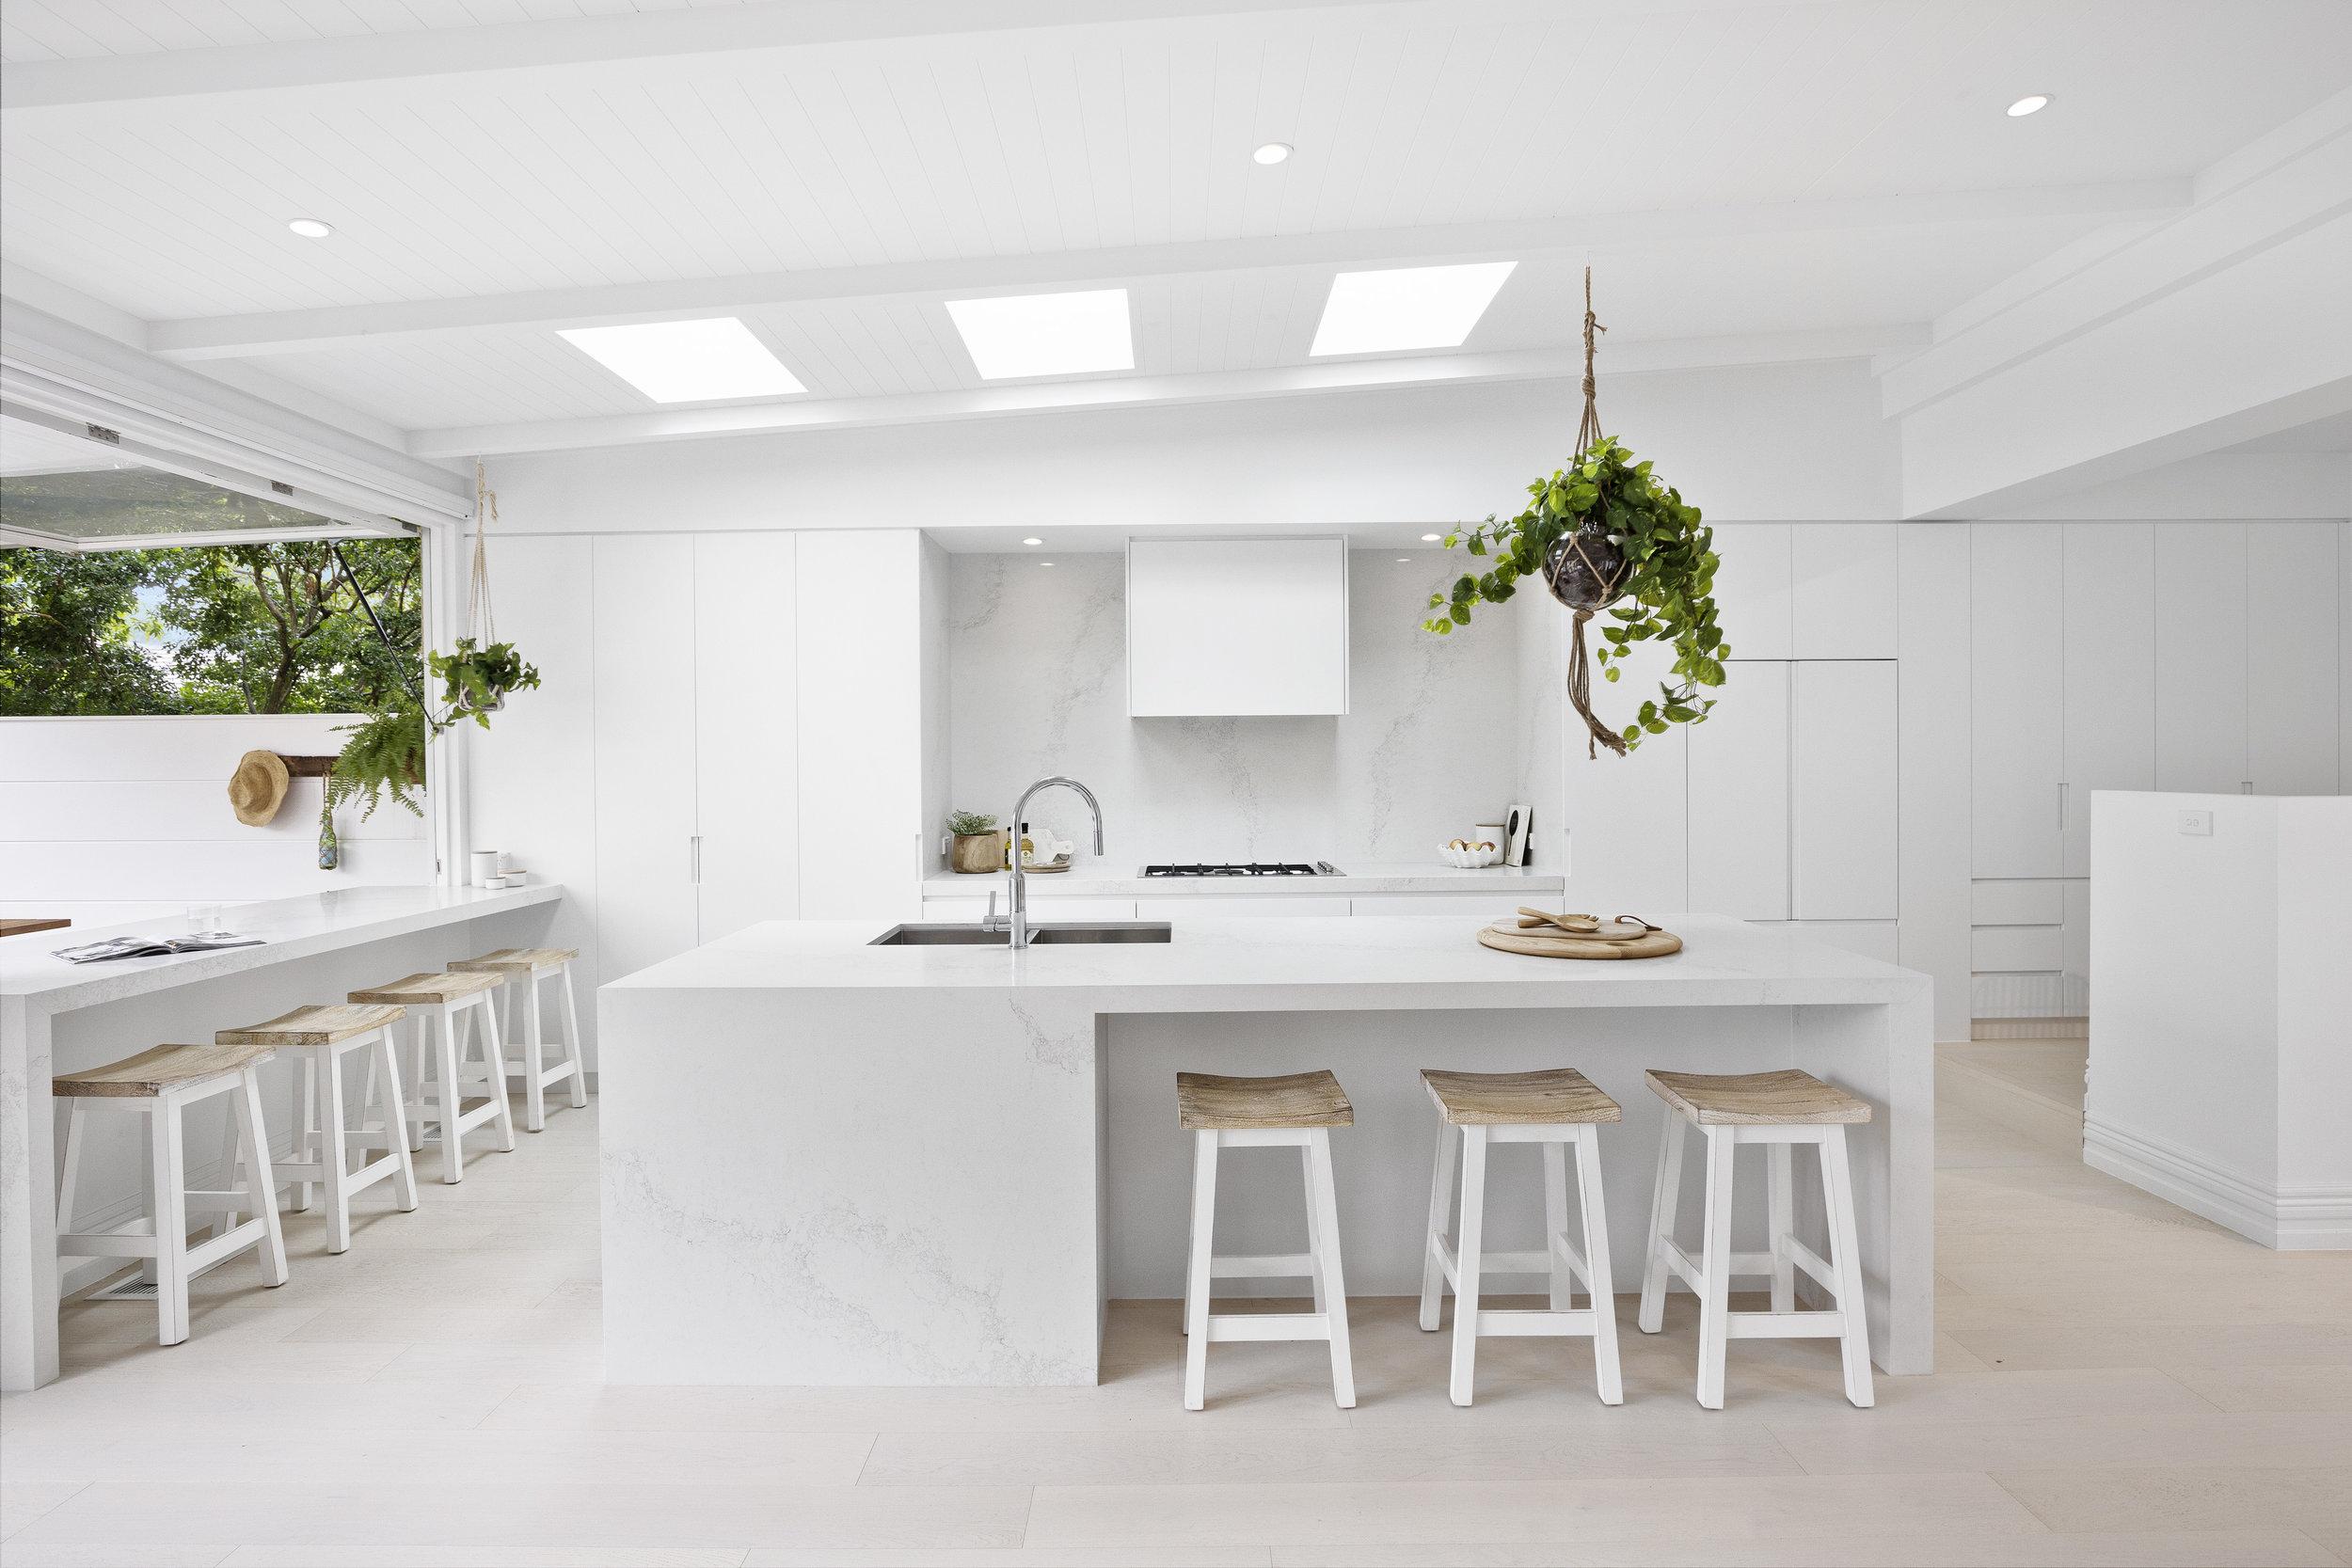 Three Birds Renovations Lana's Kitchen with Hanging Plant